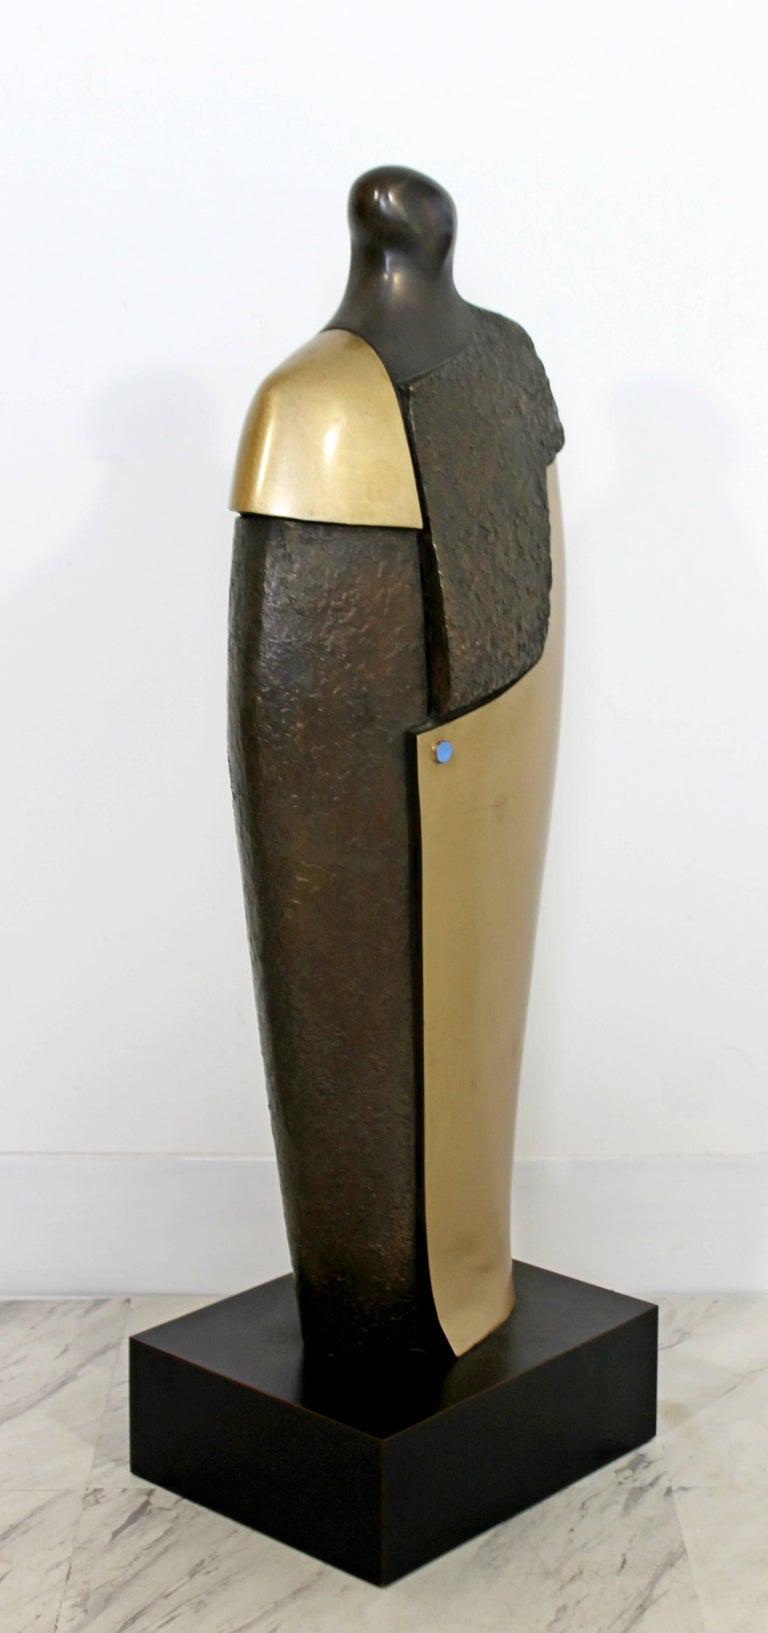 American Mid-Century Modern Bronze Brass Figure Table Sculpture John Baldwin Numbered 2/6 For Sale